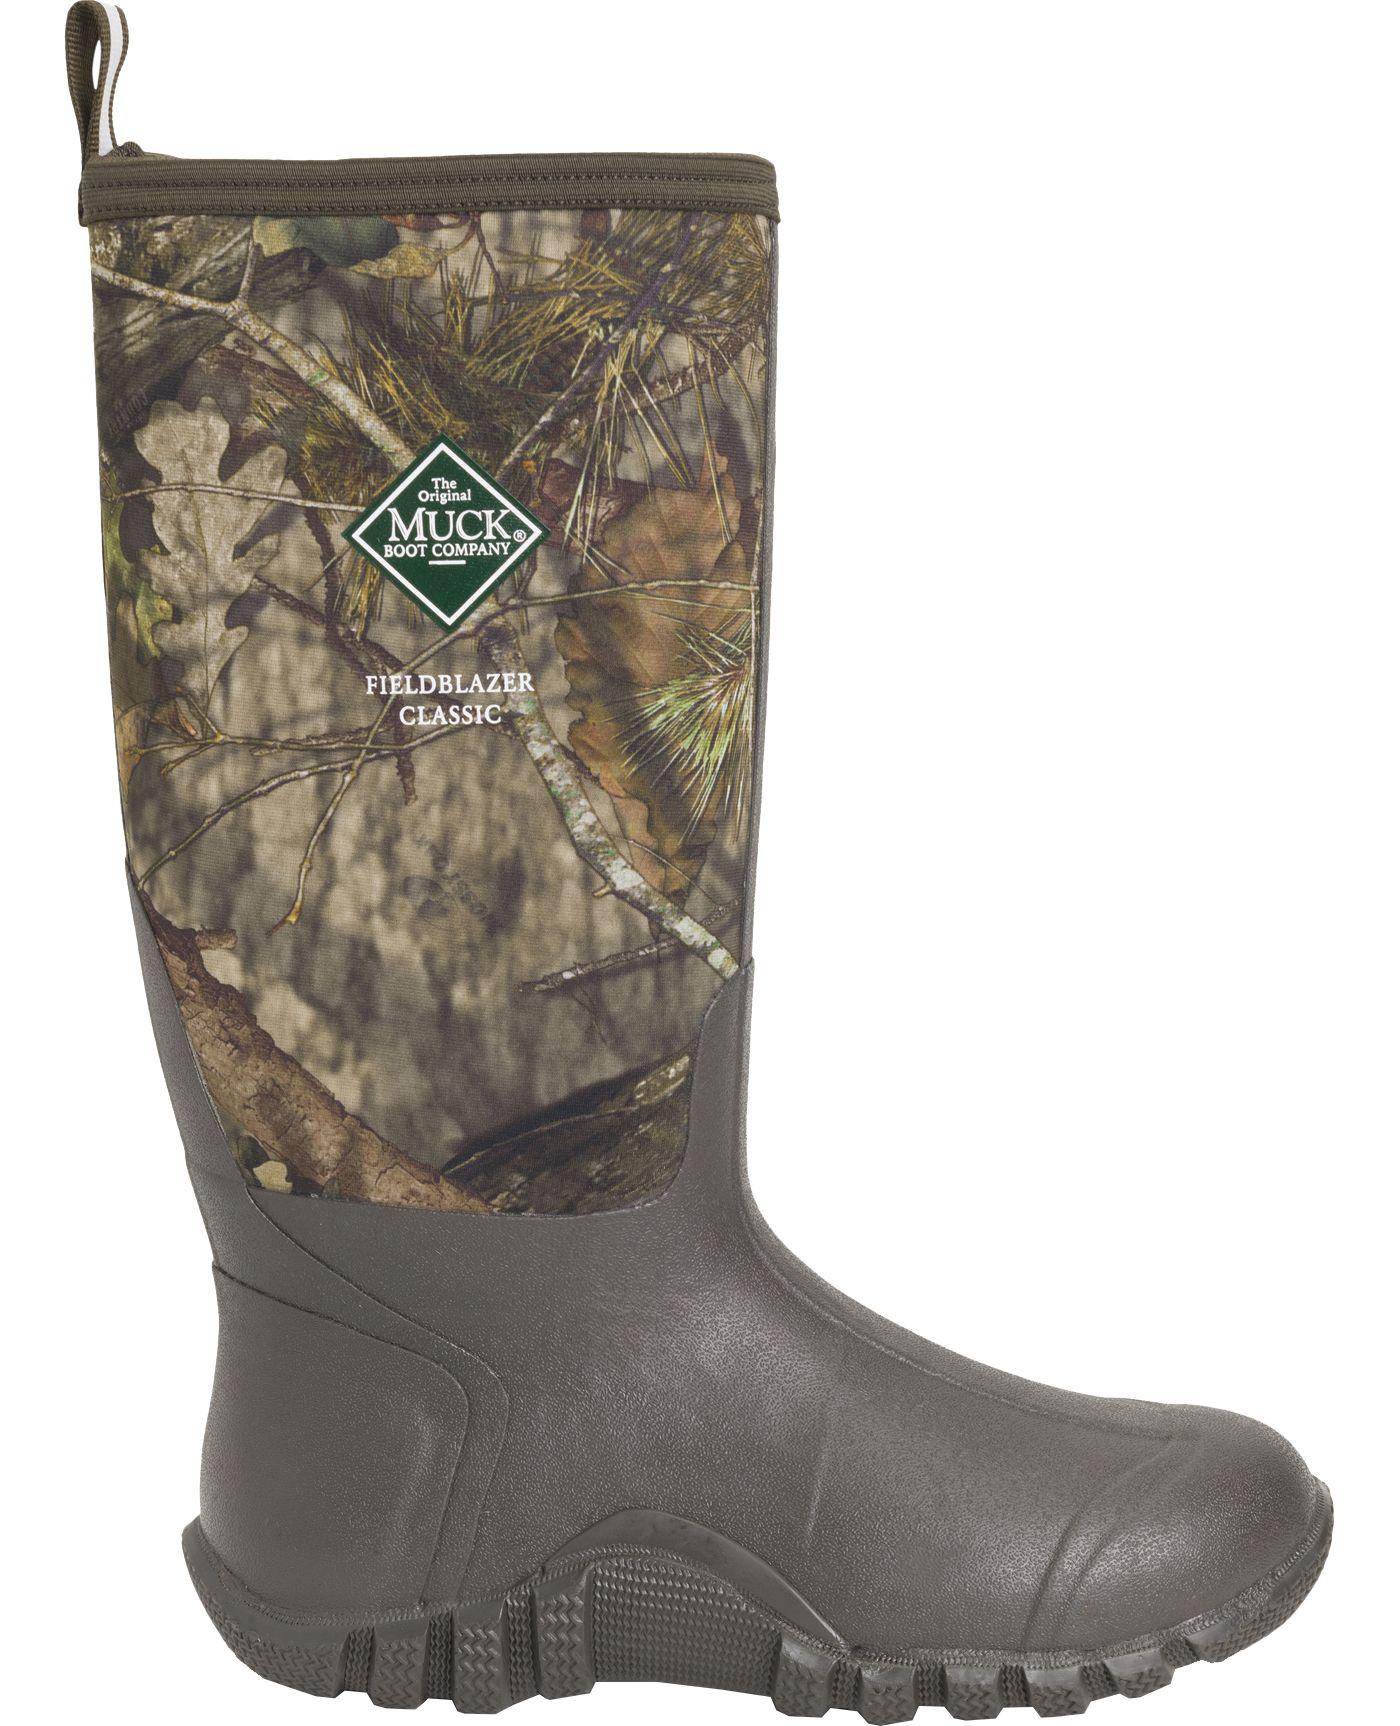 Muck Boots Men's Fieldblazer Classic Mossy Oak Rubber Hunting Boots